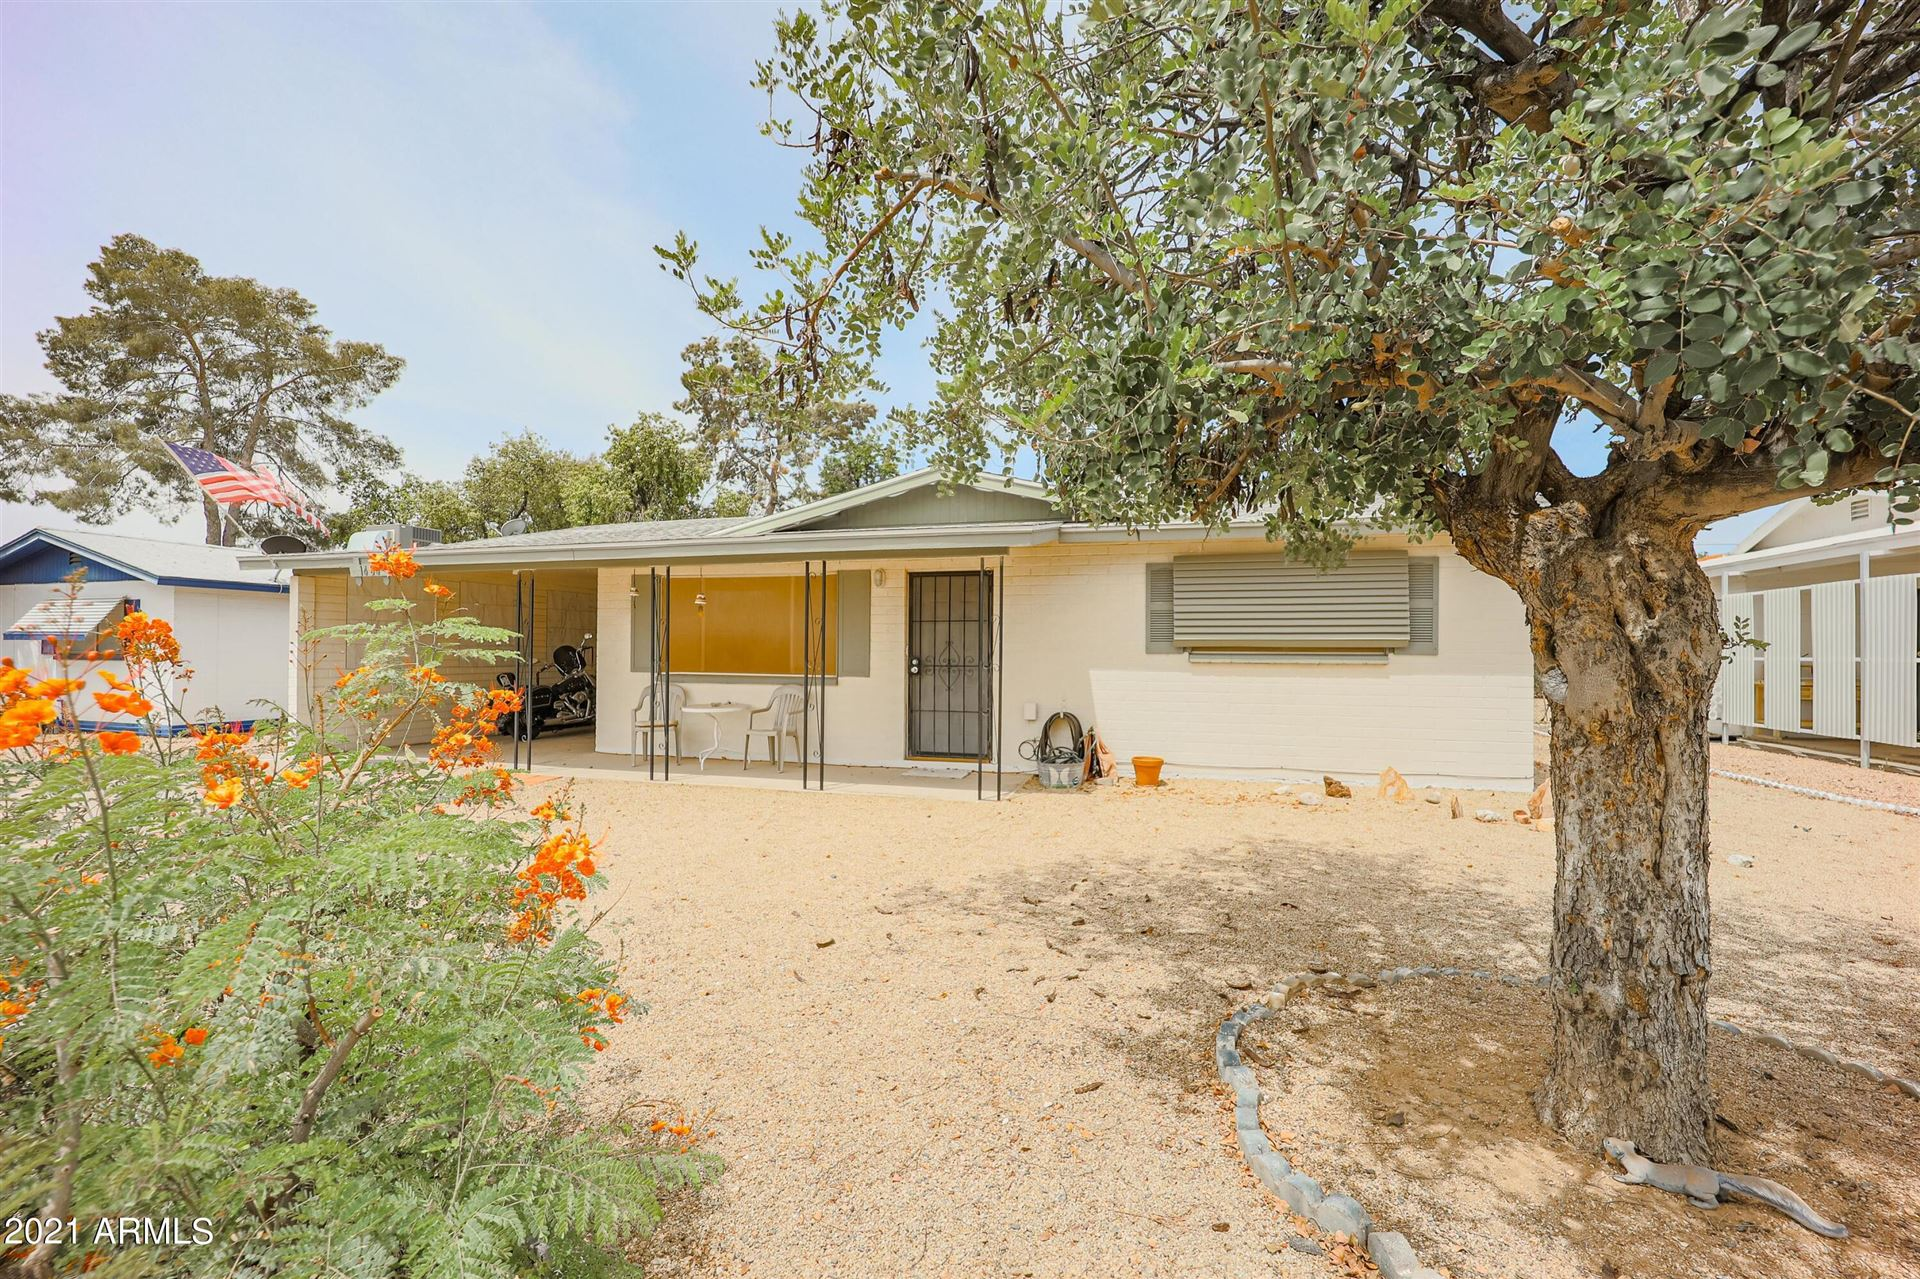 Photo of 1484 S GRAND Drive, Apache Junction, AZ 85120 (MLS # 6246078)